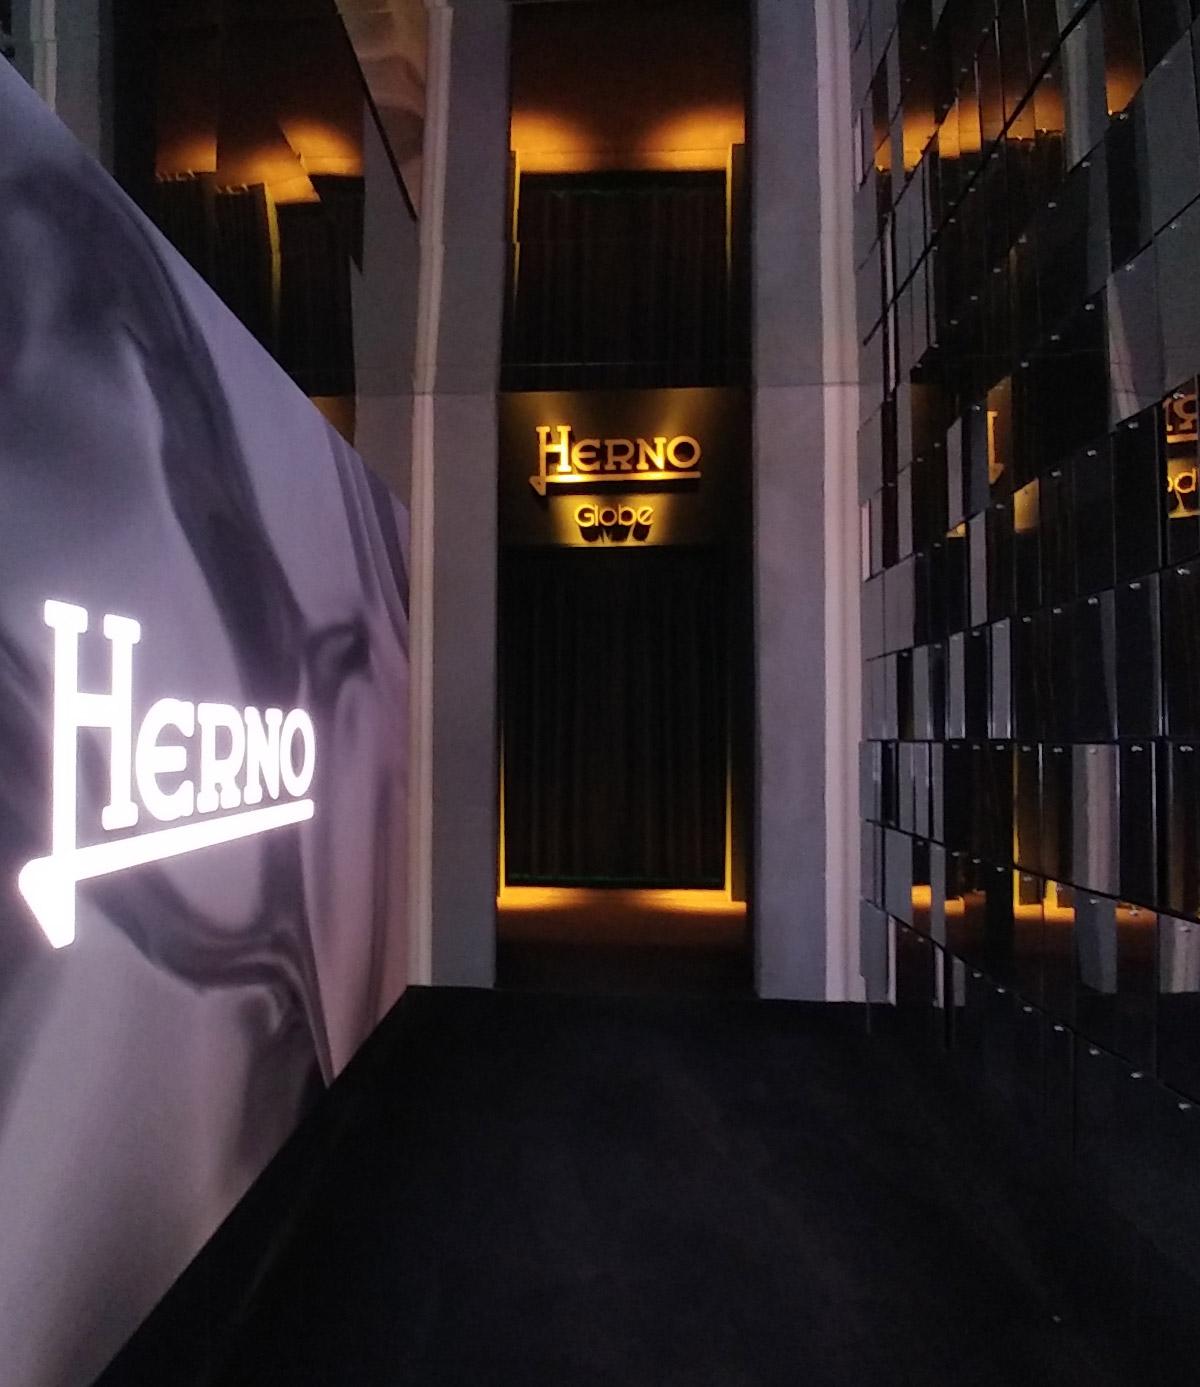 herno_firenze_entrance2